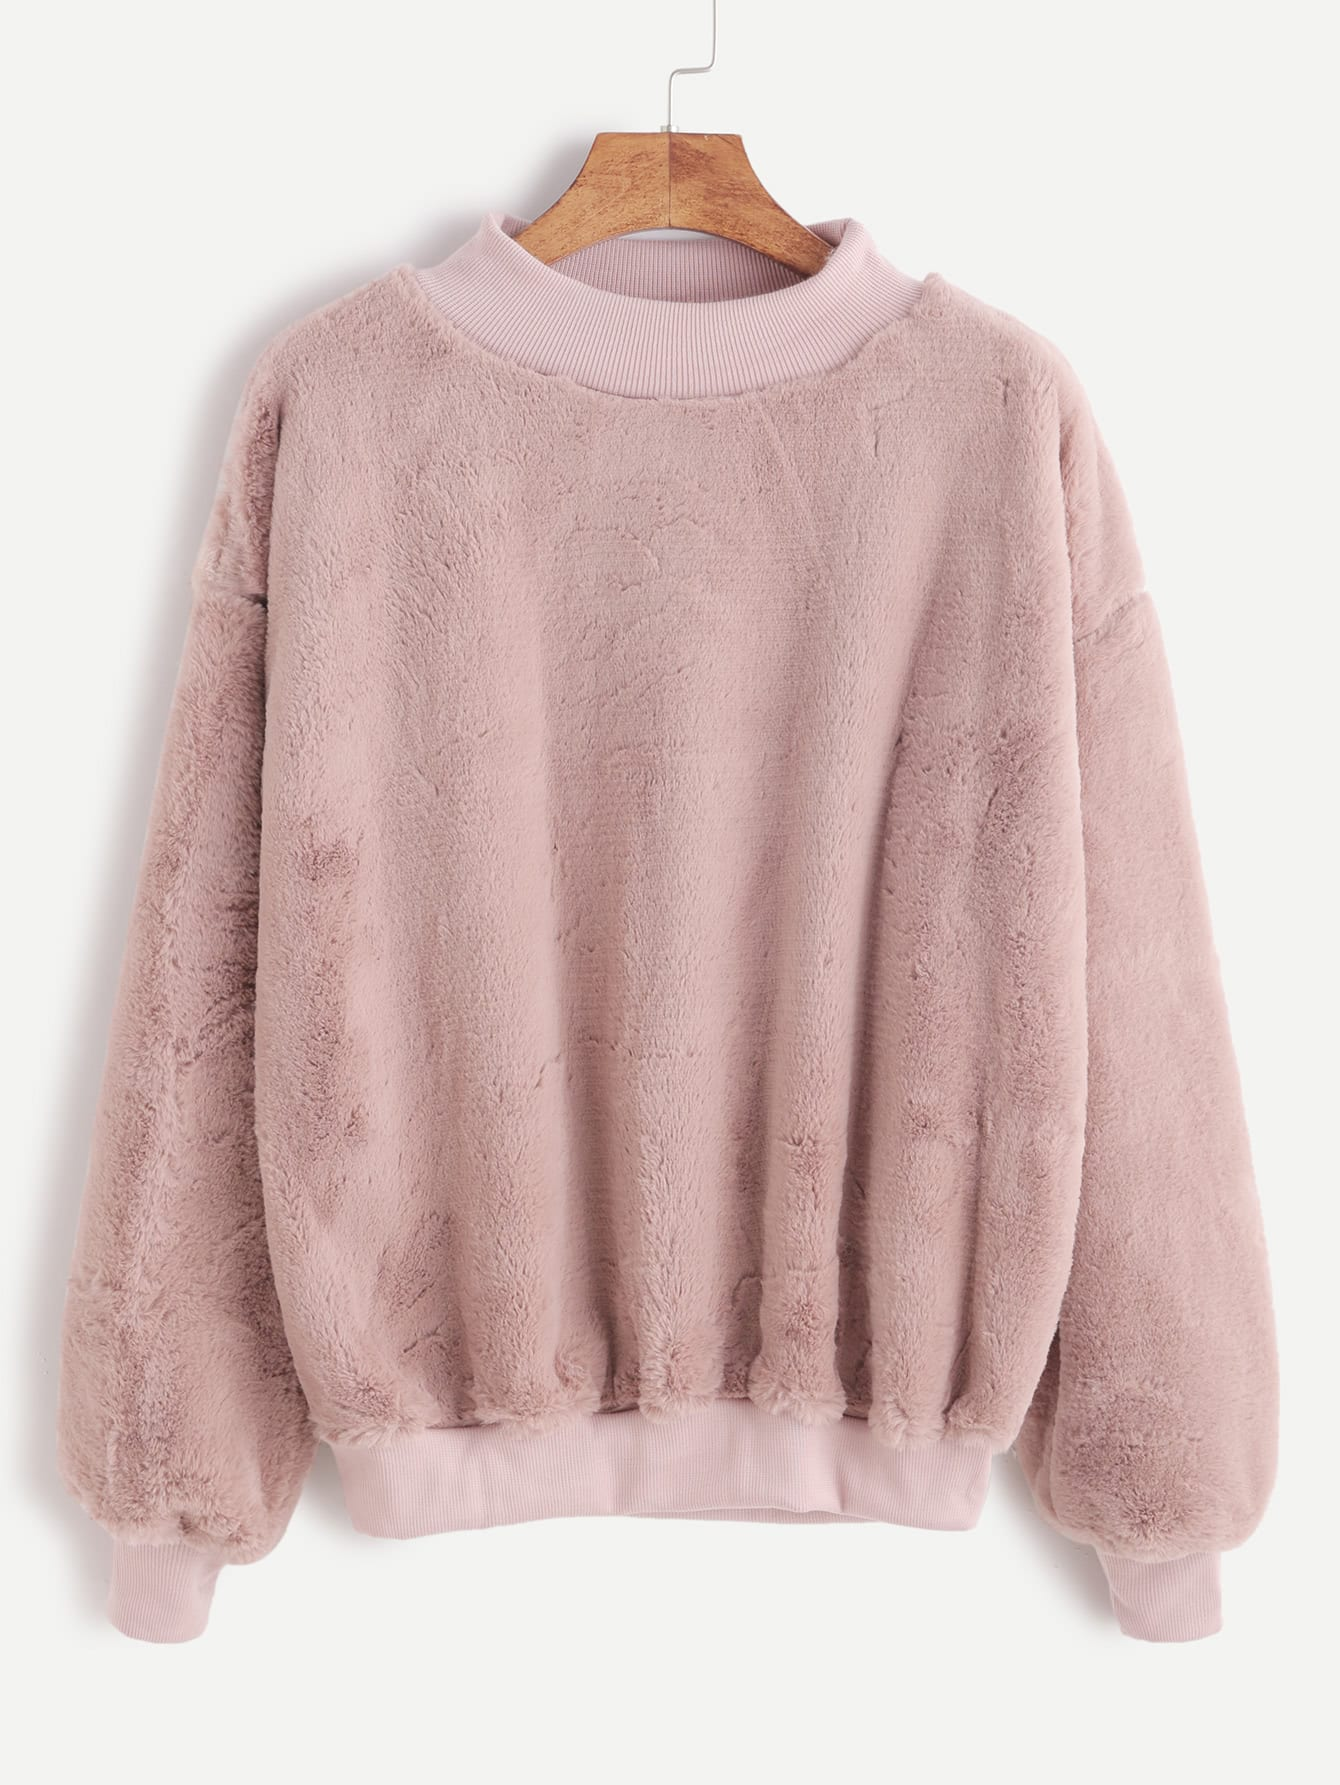 Contrast Ribbed Trim Drop Shoulder Fluffy Sweatshirt sweatshirt161104102